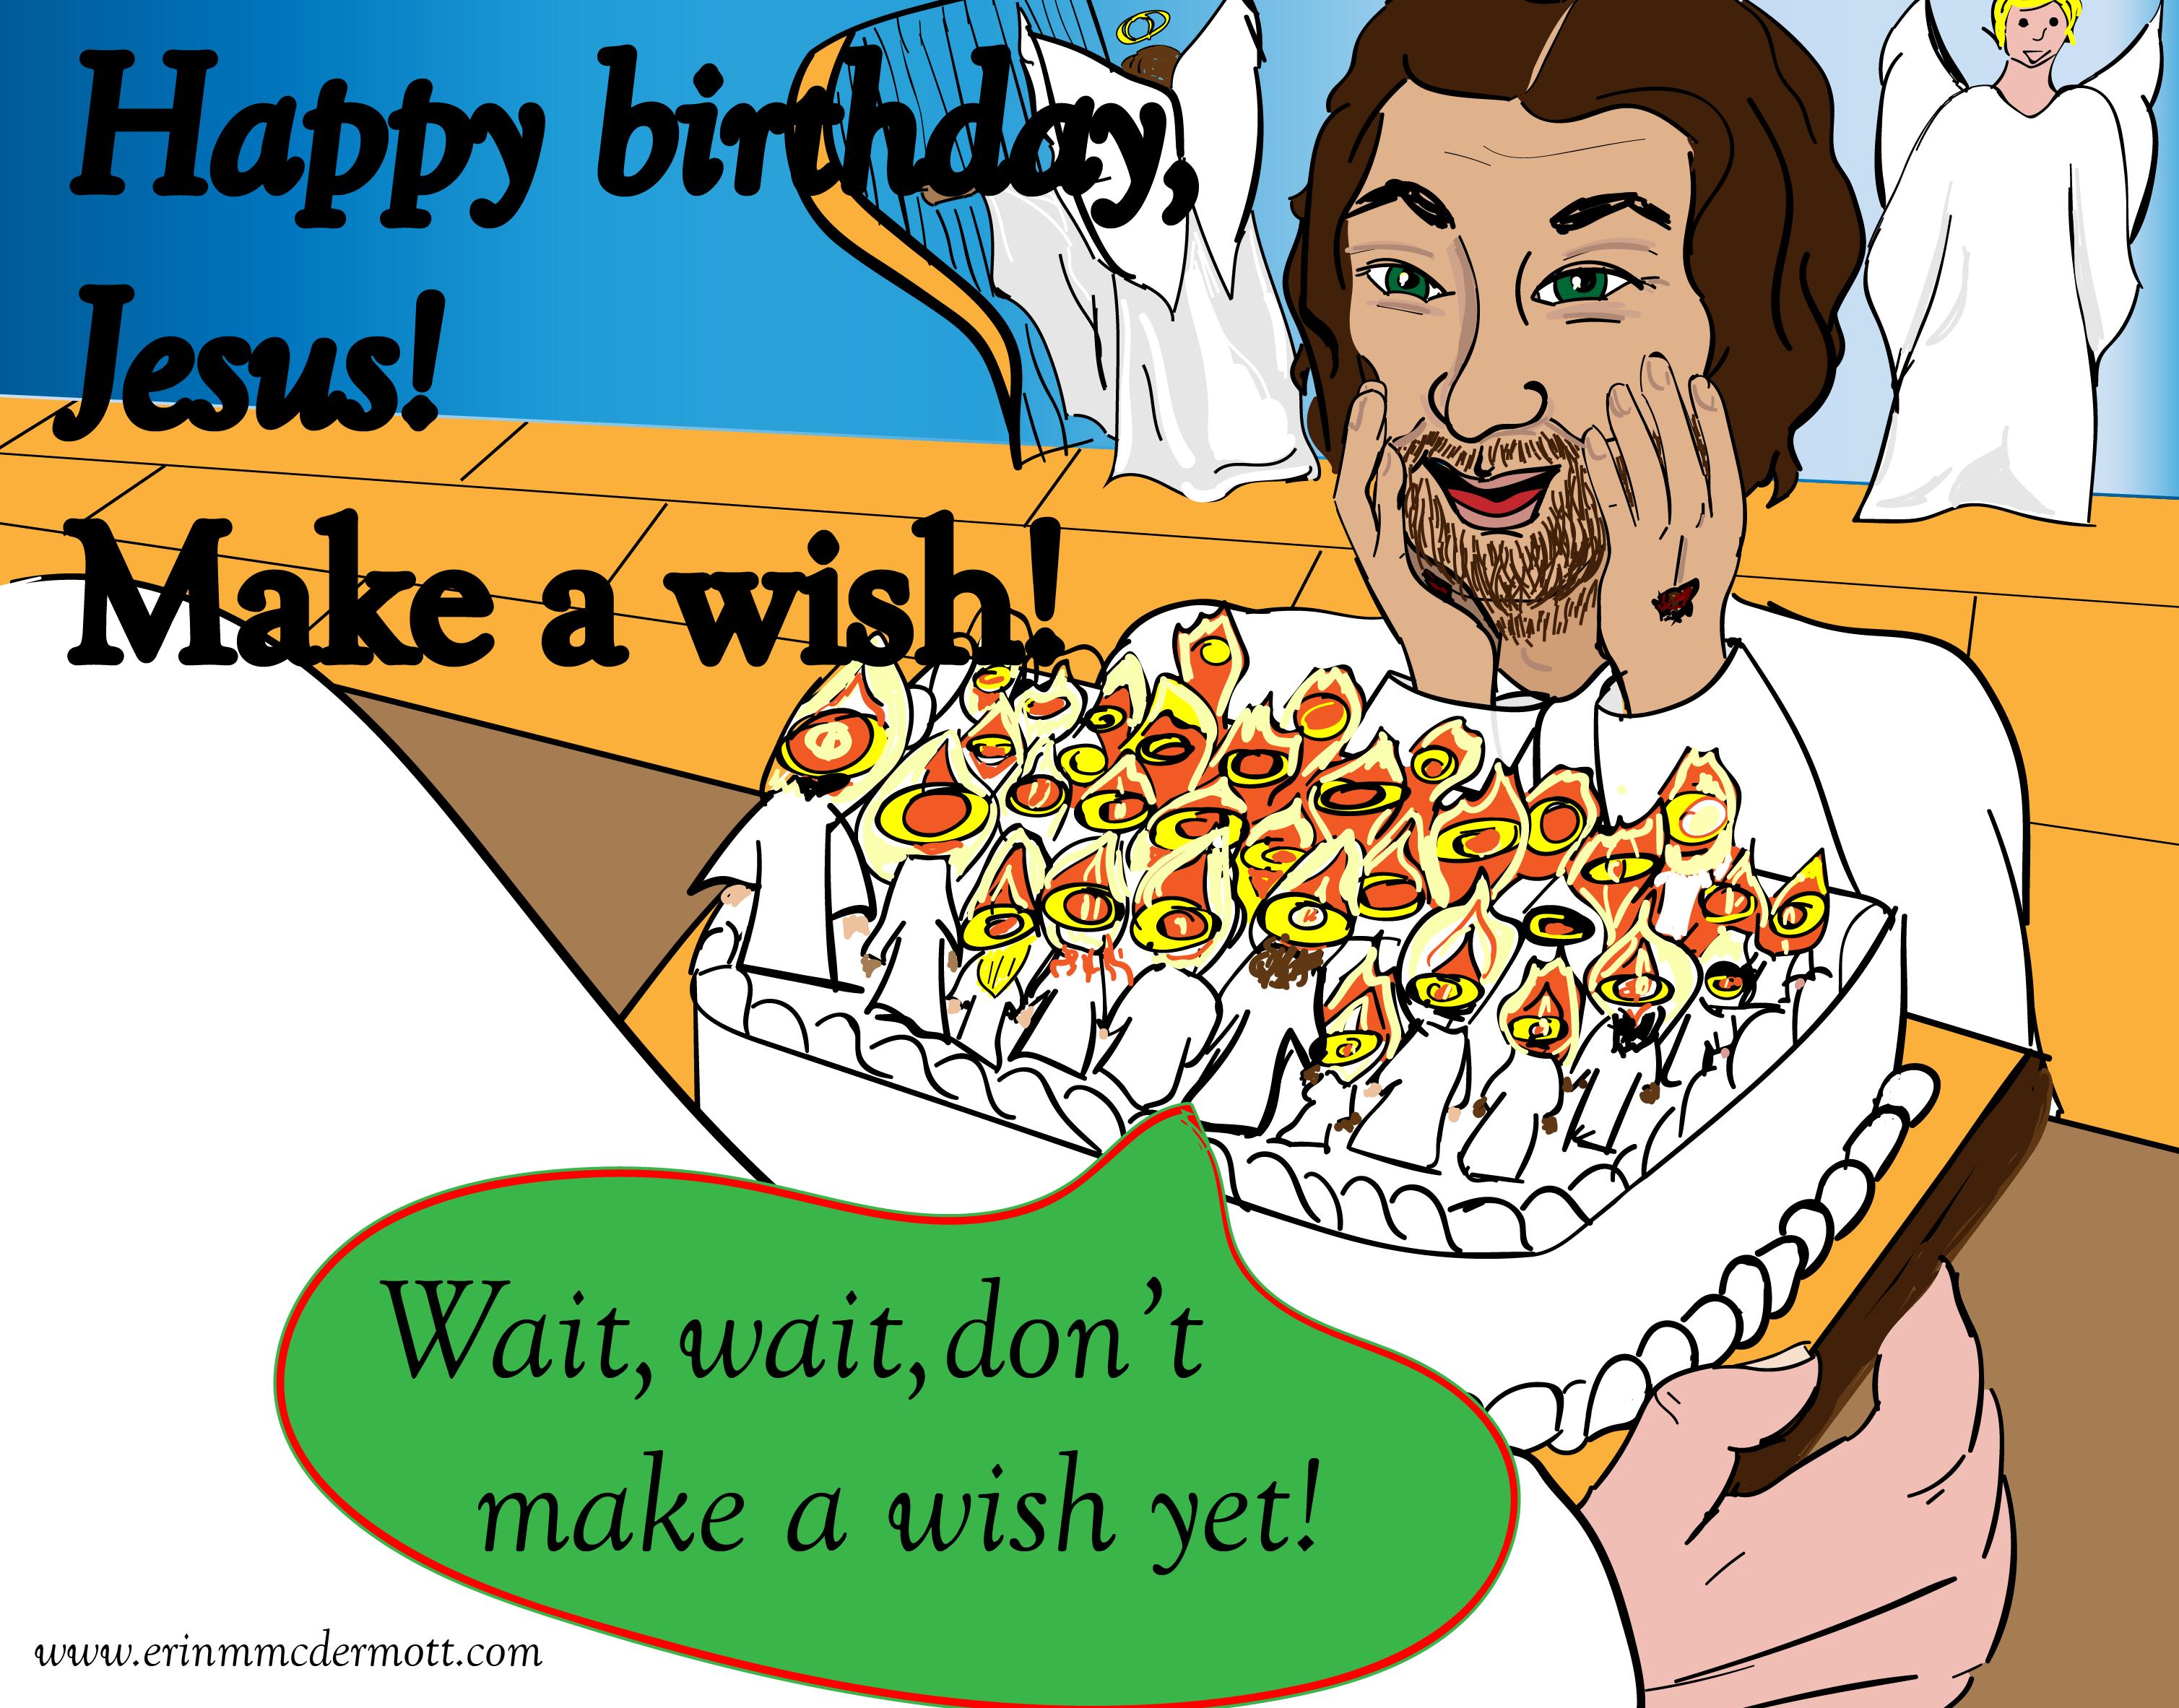 Happy Brthday Jesus Make A Wish